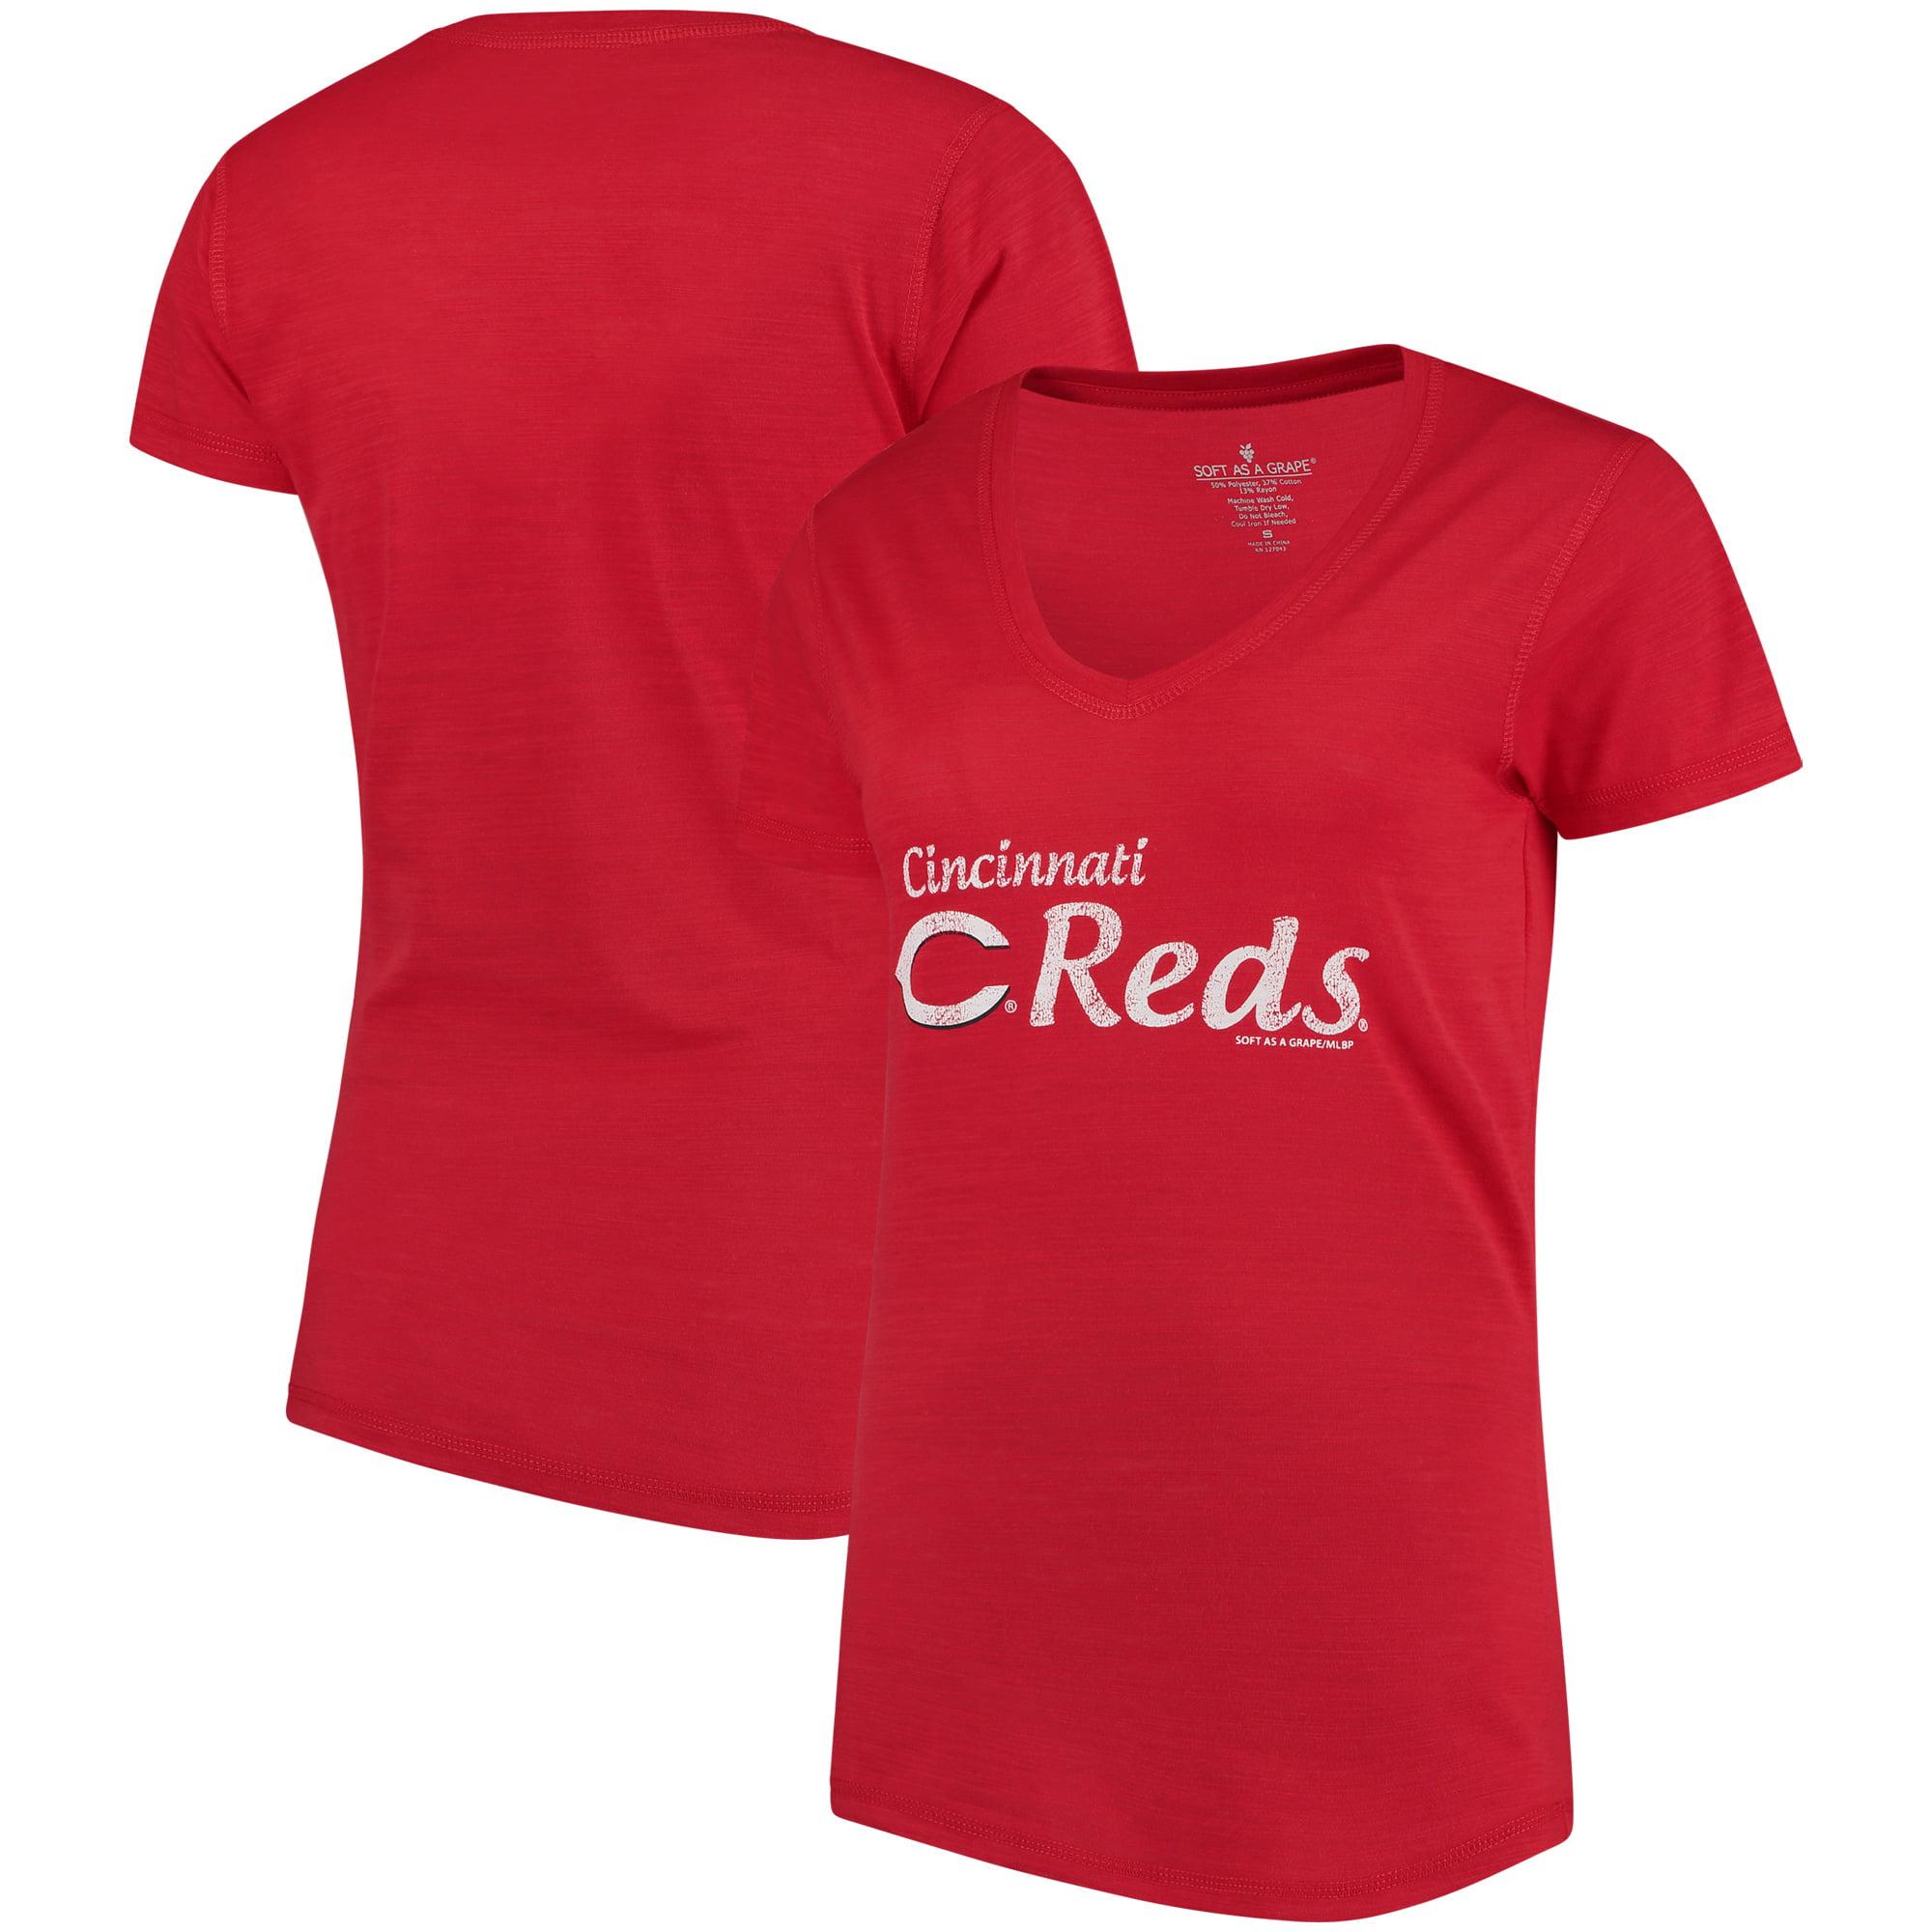 Cincinnati Reds Soft As A Grape Women's Double Steal Tri-Blend V-Neck T-Shirt - Red